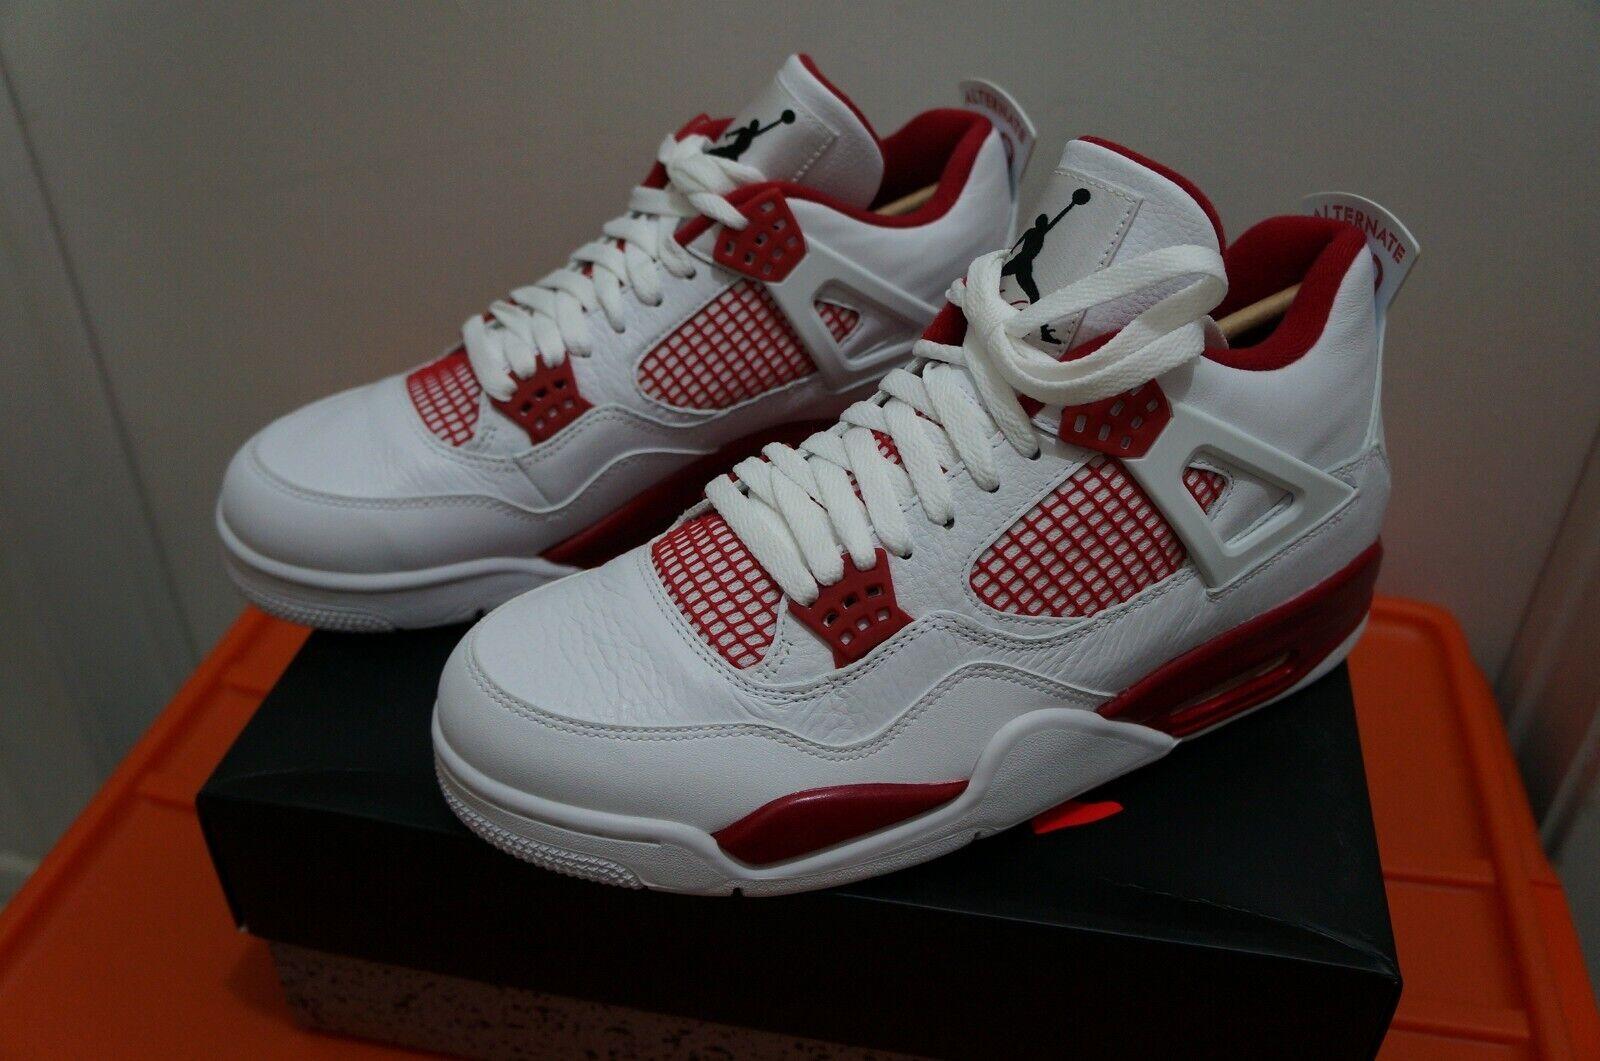 Air Jordan IV 4 Retro Alternate 89 White   Gym Red Mens Size SZ 10.5 308497-106